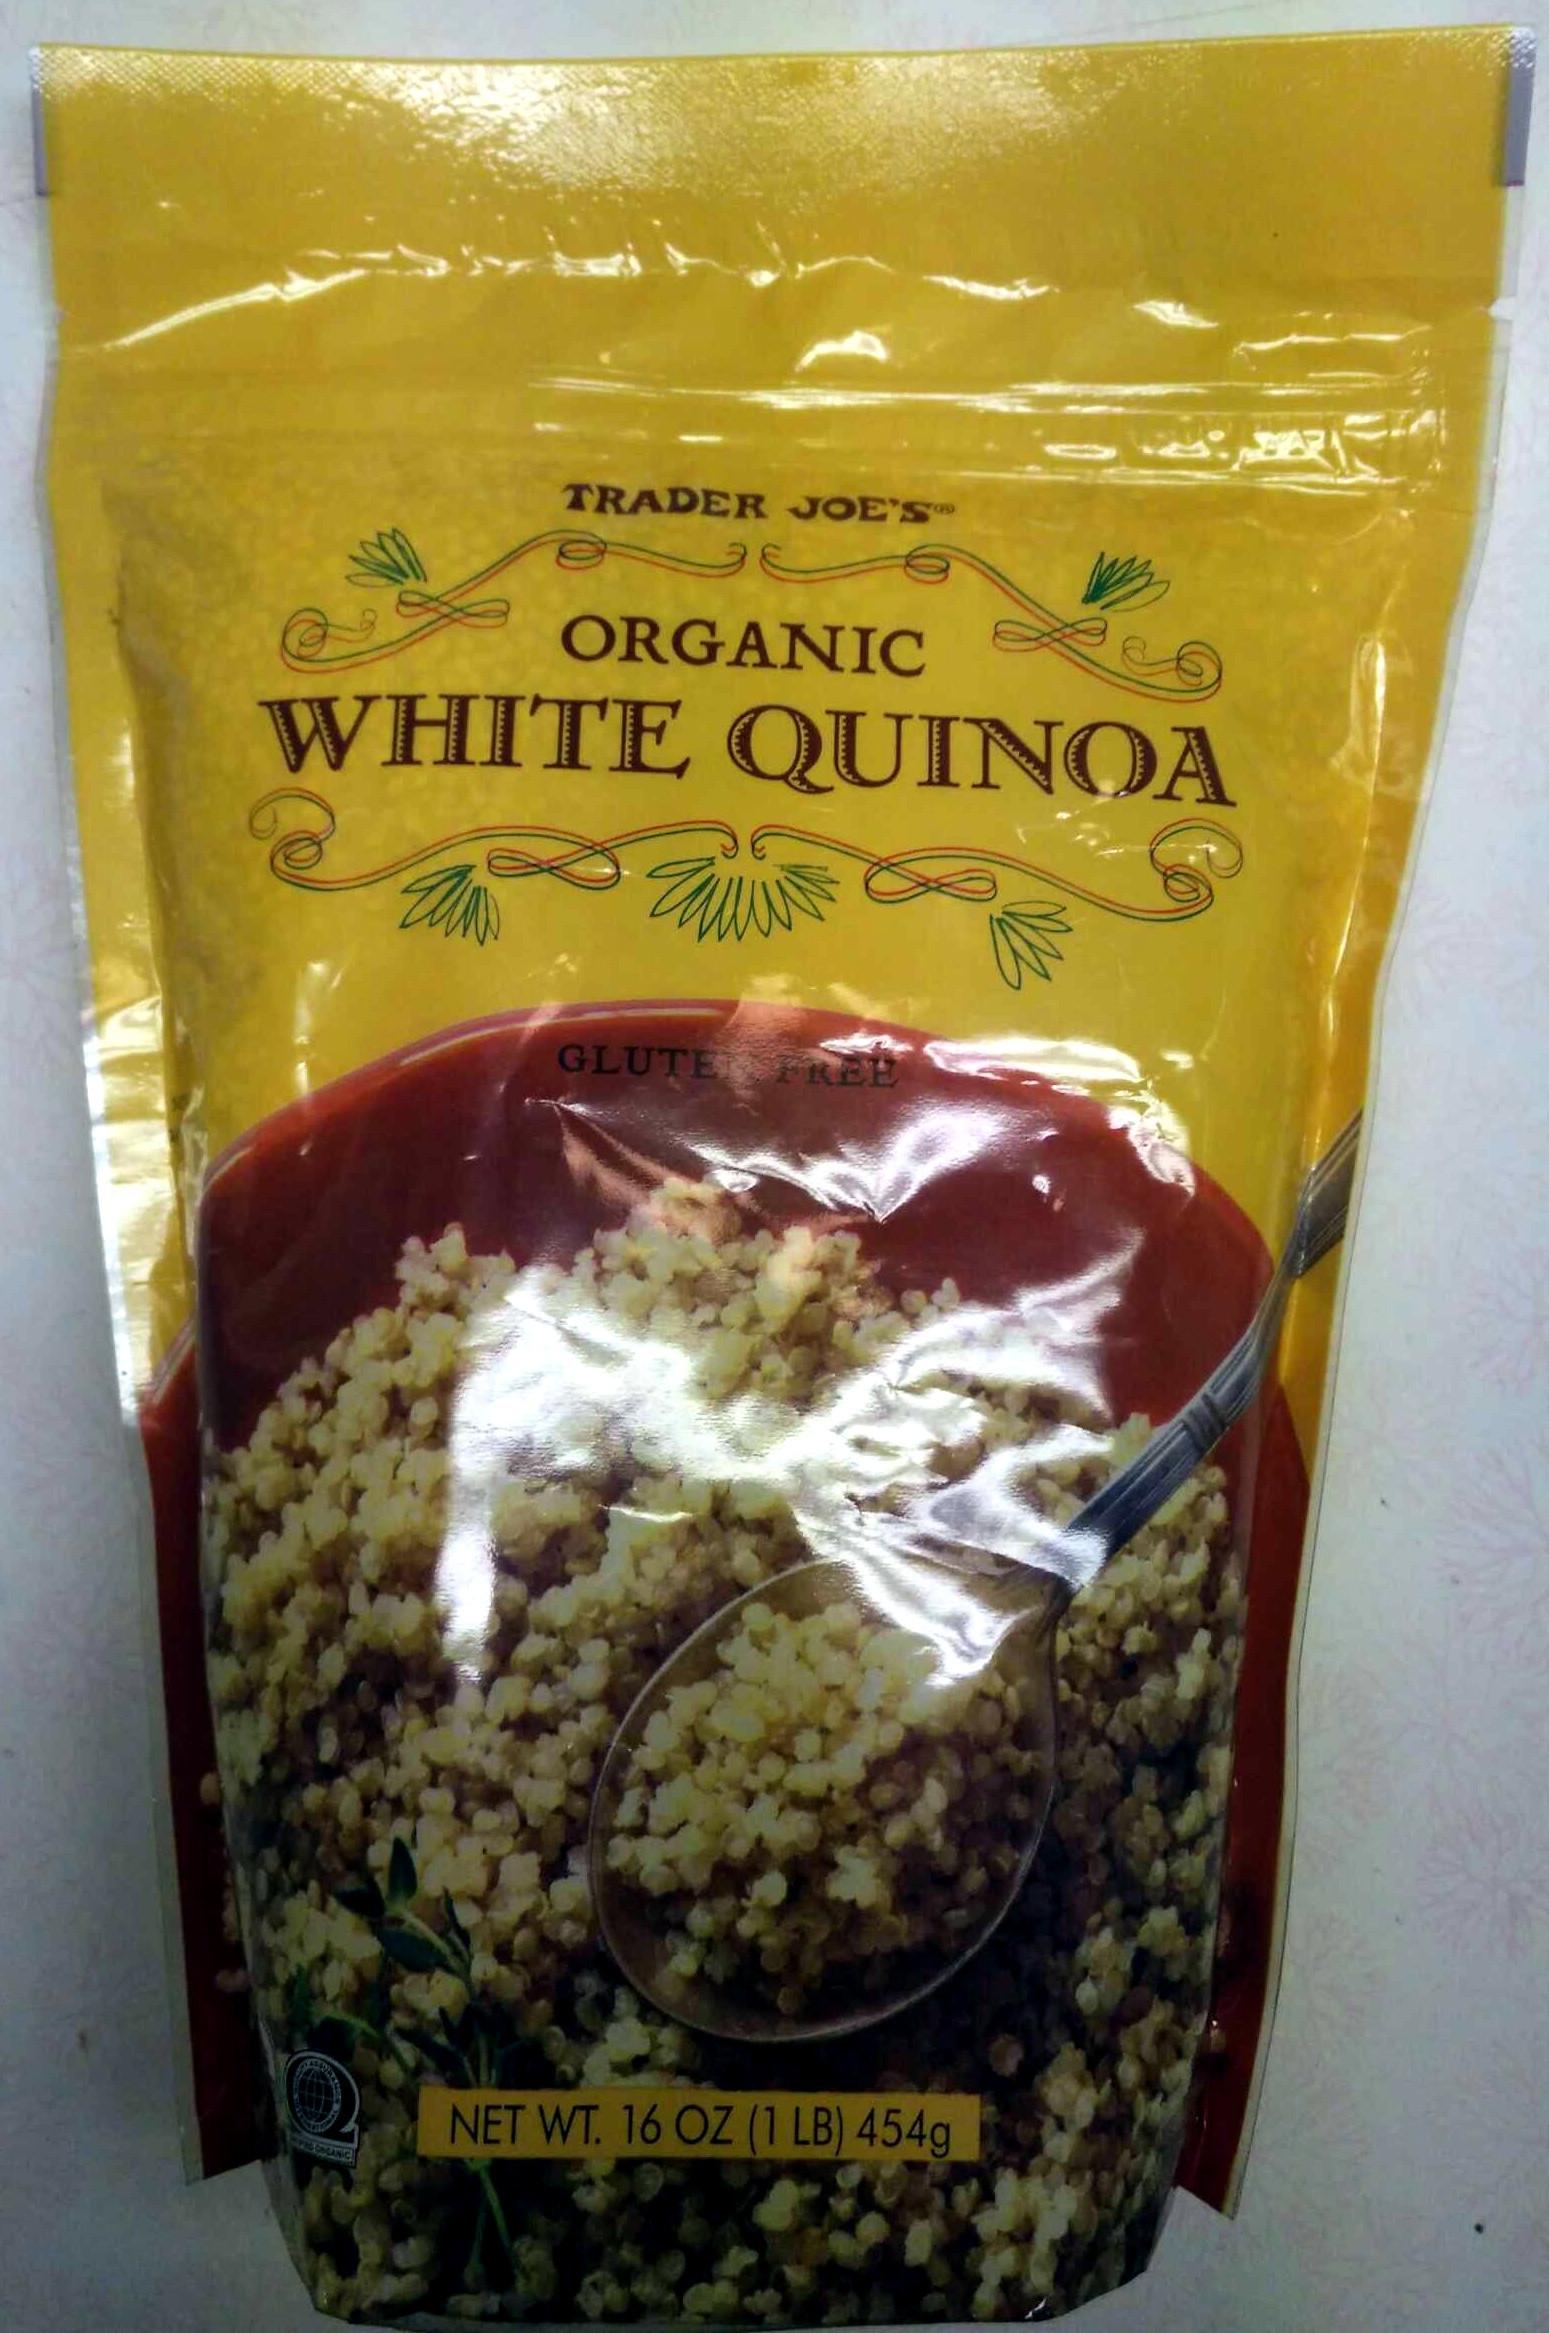 Trader Joe'S Organic Quinoa  Organic White Quinoa Trader Joe s 16 OZ 1 LB 454g